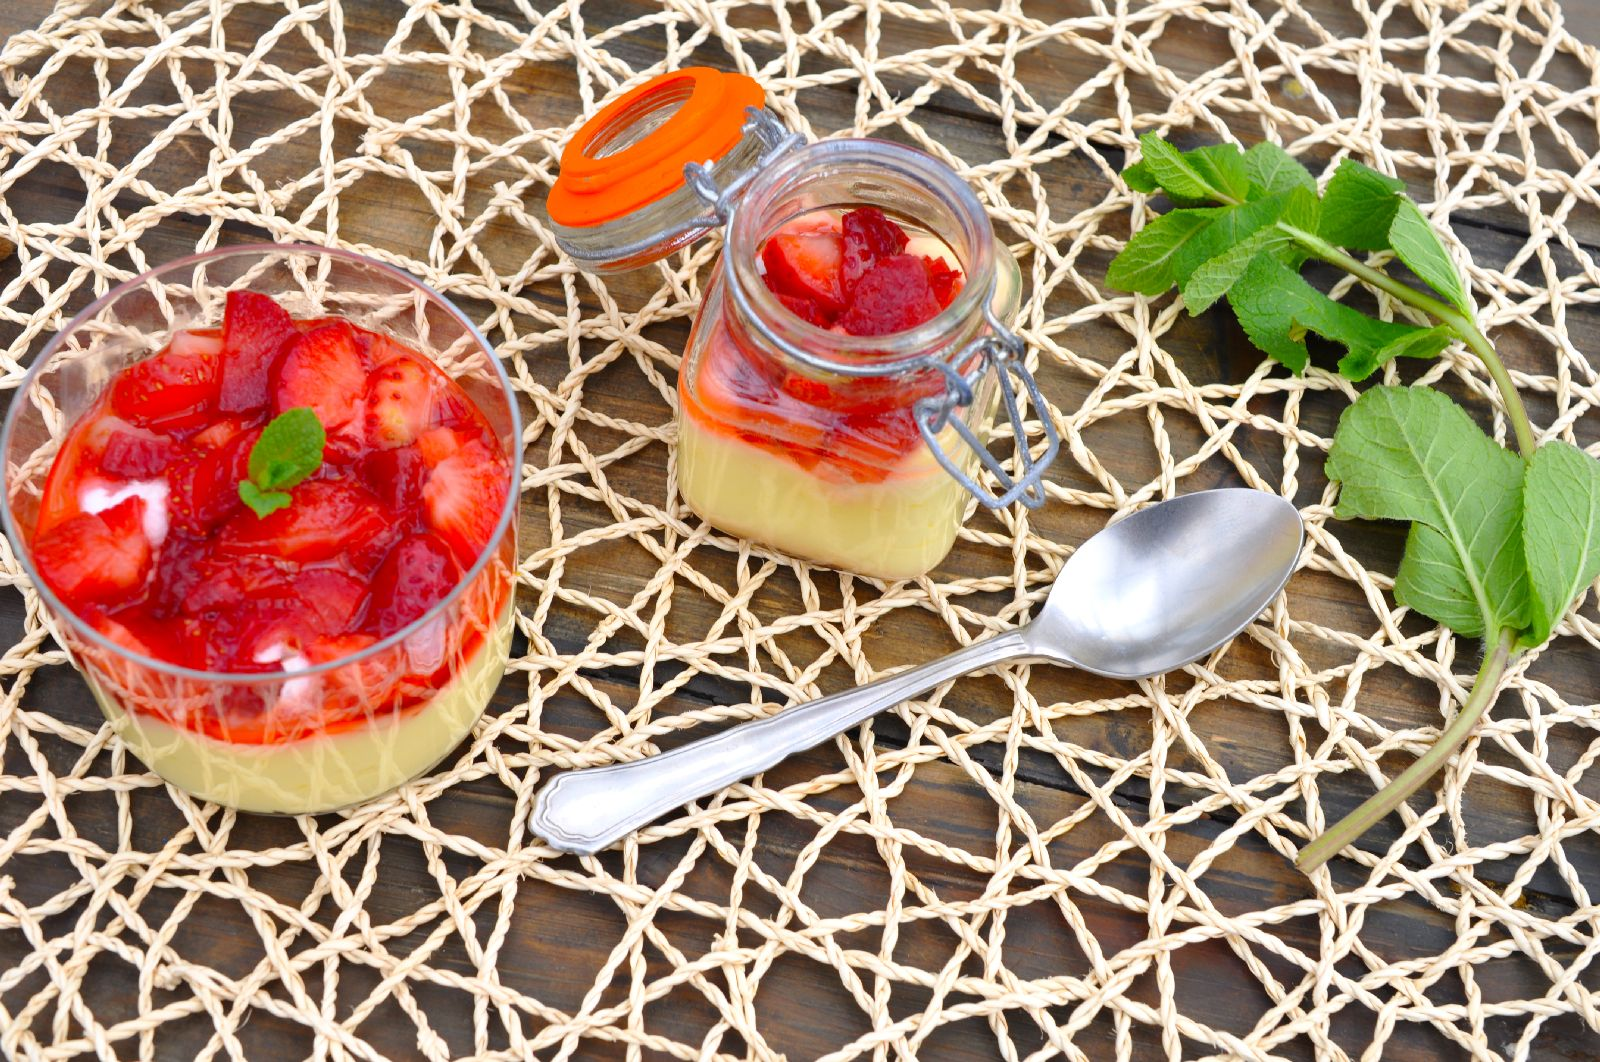 Limonina krema z jagodami1_web